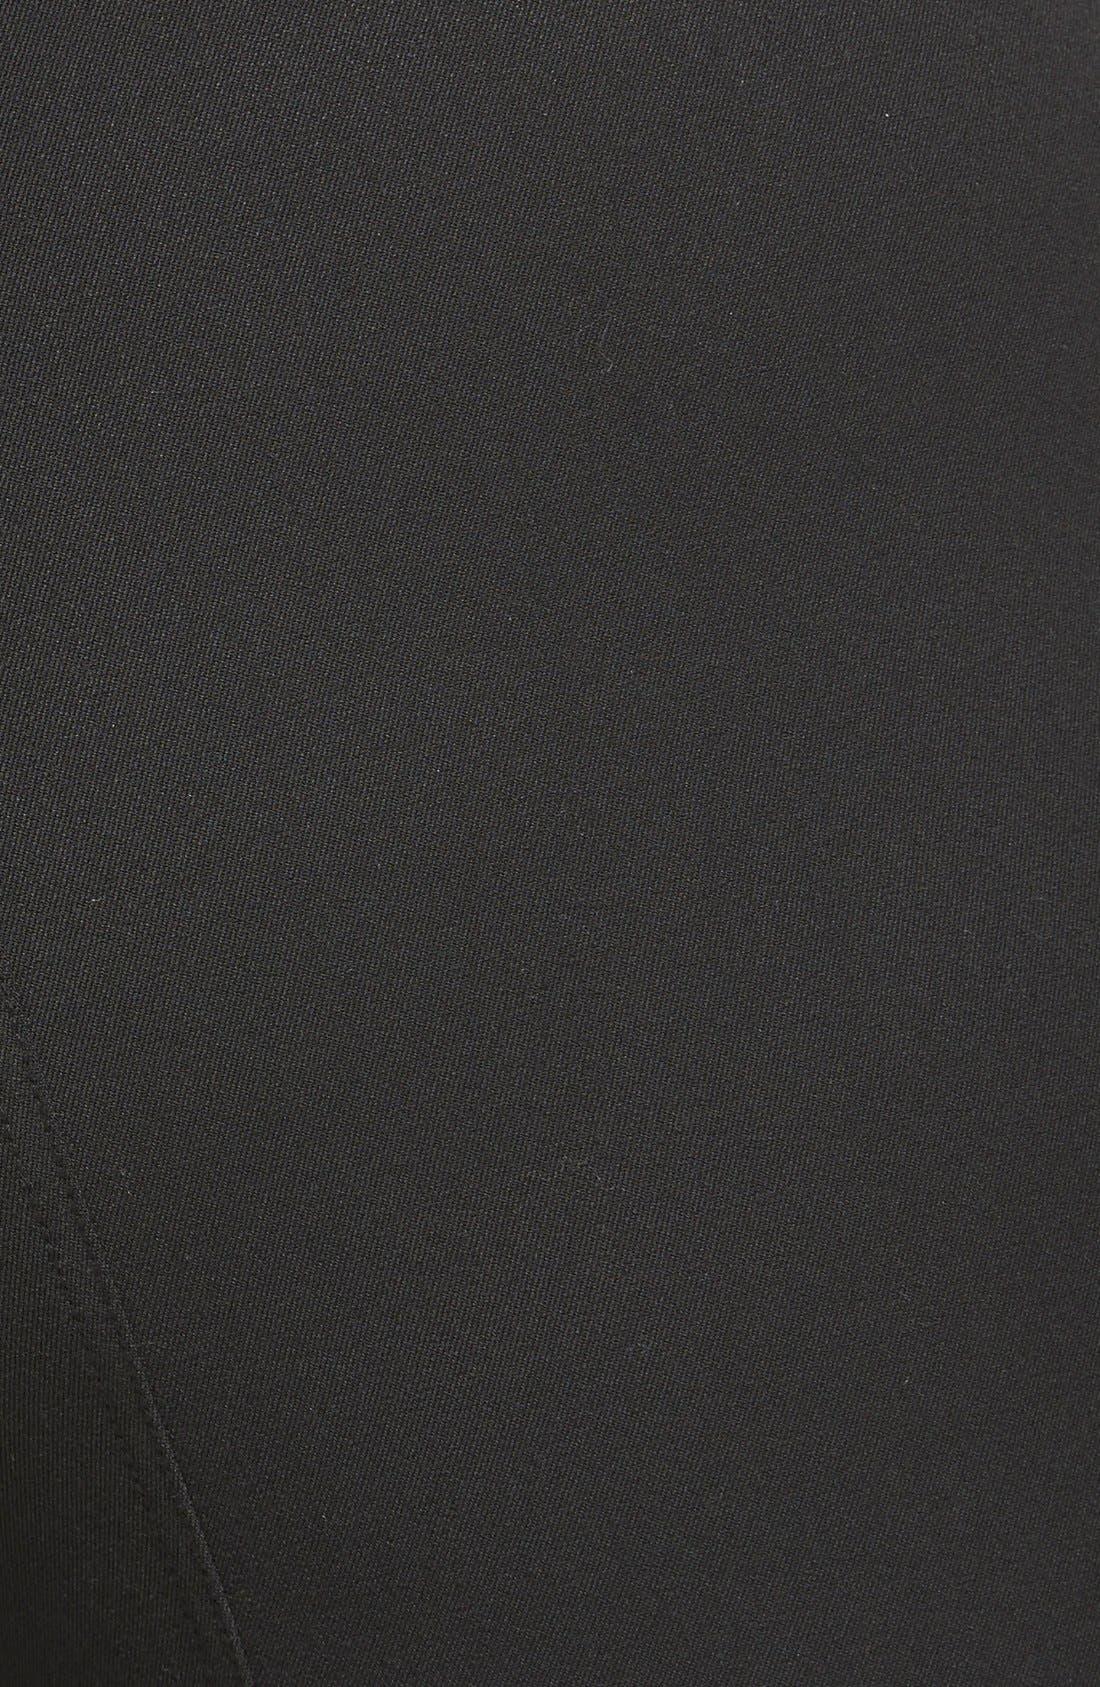 Alternate Image 5  - Vince Camuto Seam Detail Pants (Plus Size)